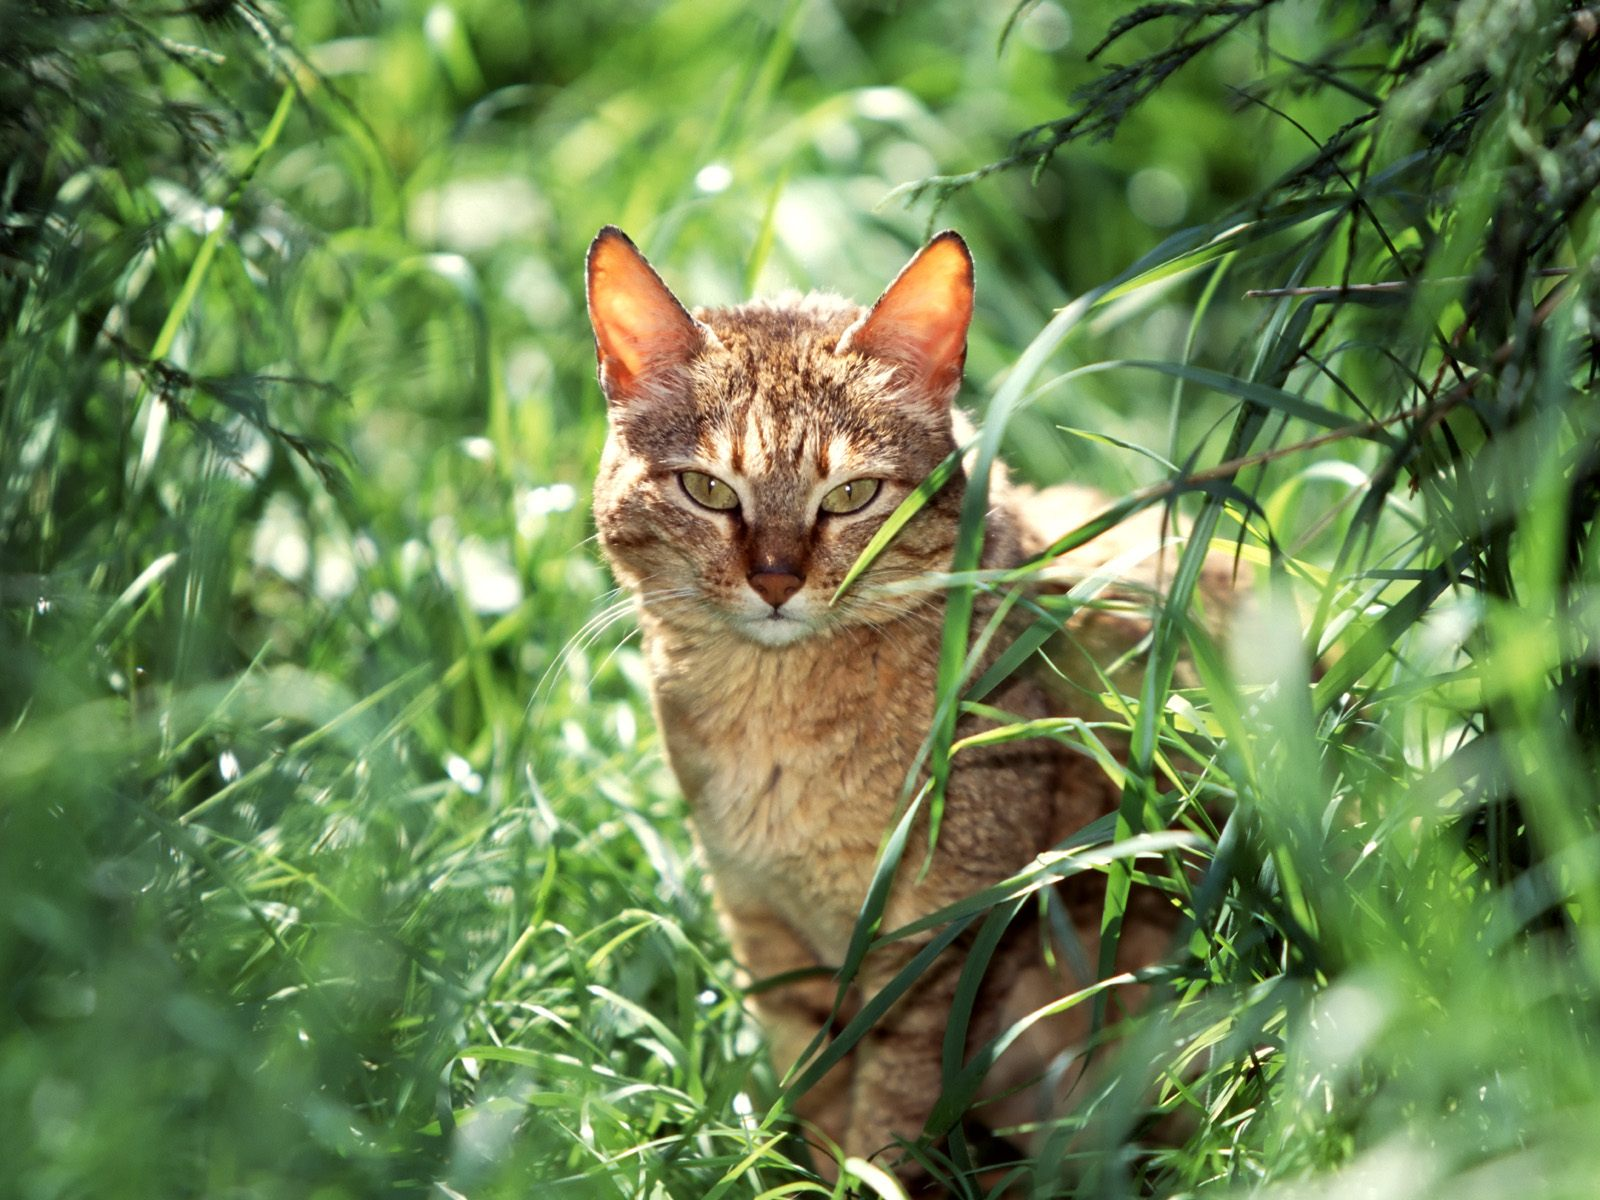 wild cat 1 - Warrior Cats Forever Wallpaper (30386593 ...